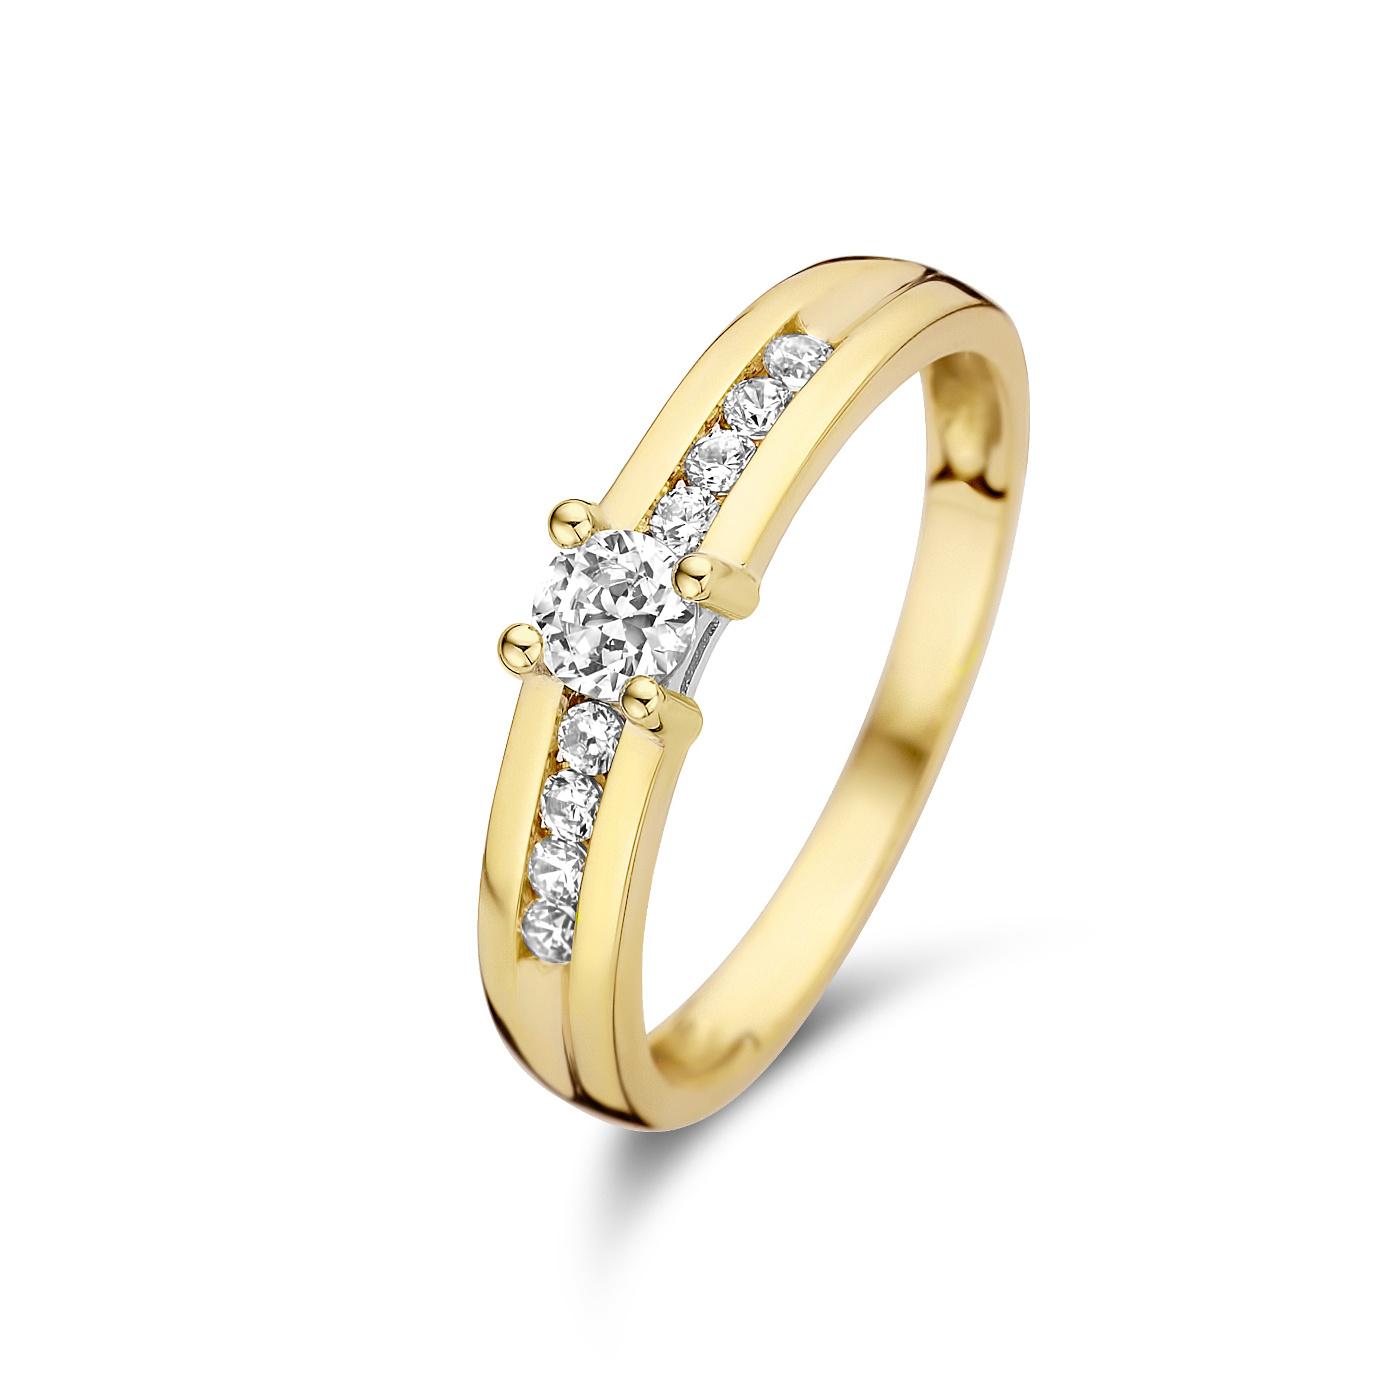 Isabel Bernard Le Marais Estée 14 carat gold ring zirconia